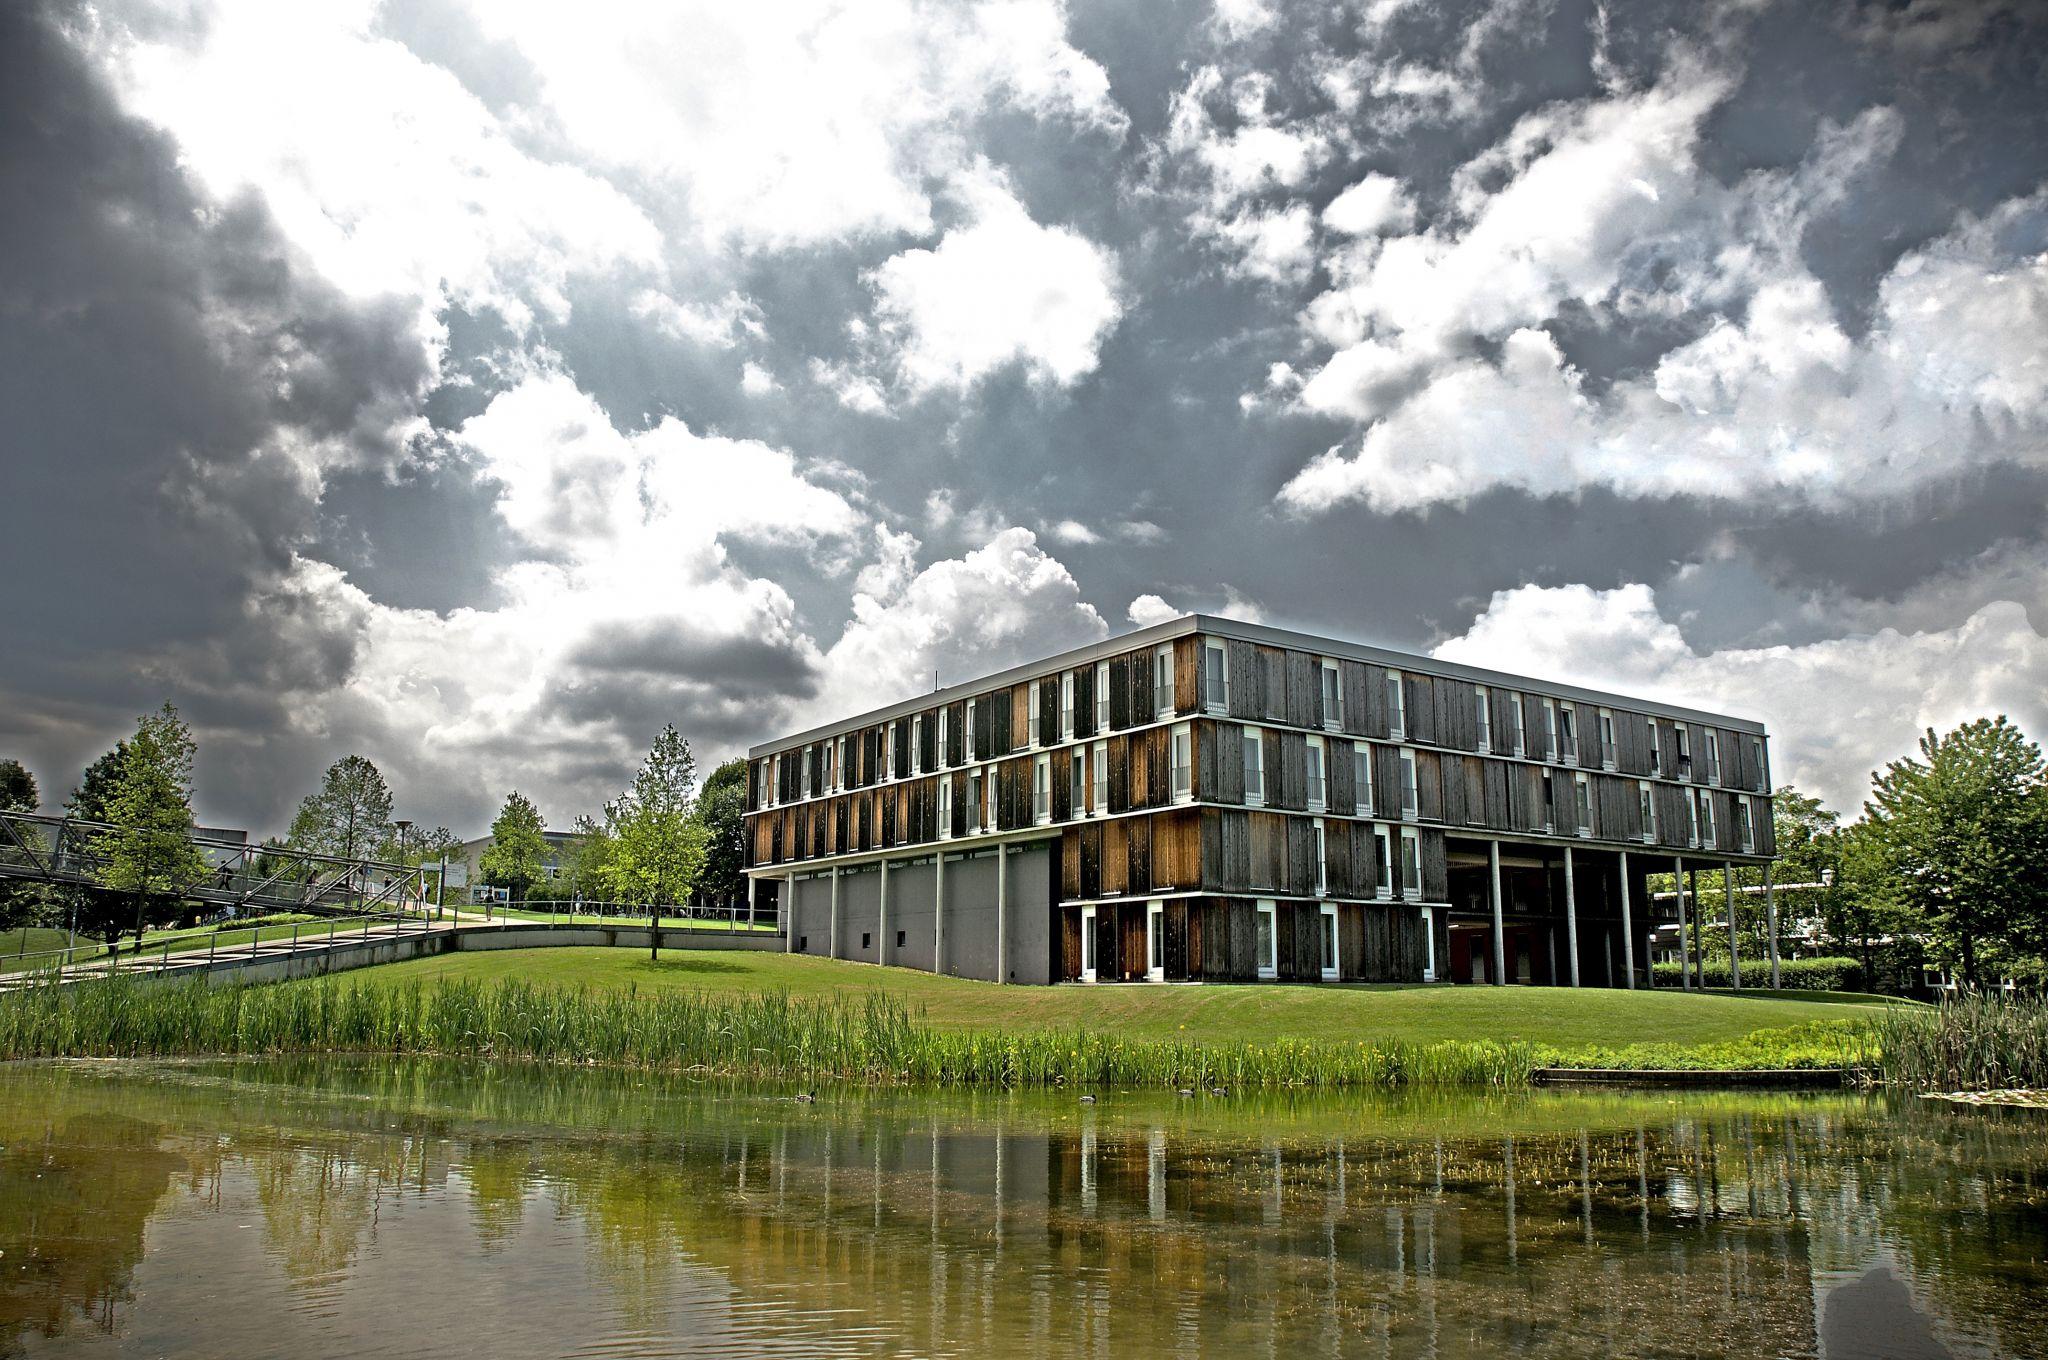 University of Stuttgart, Germany